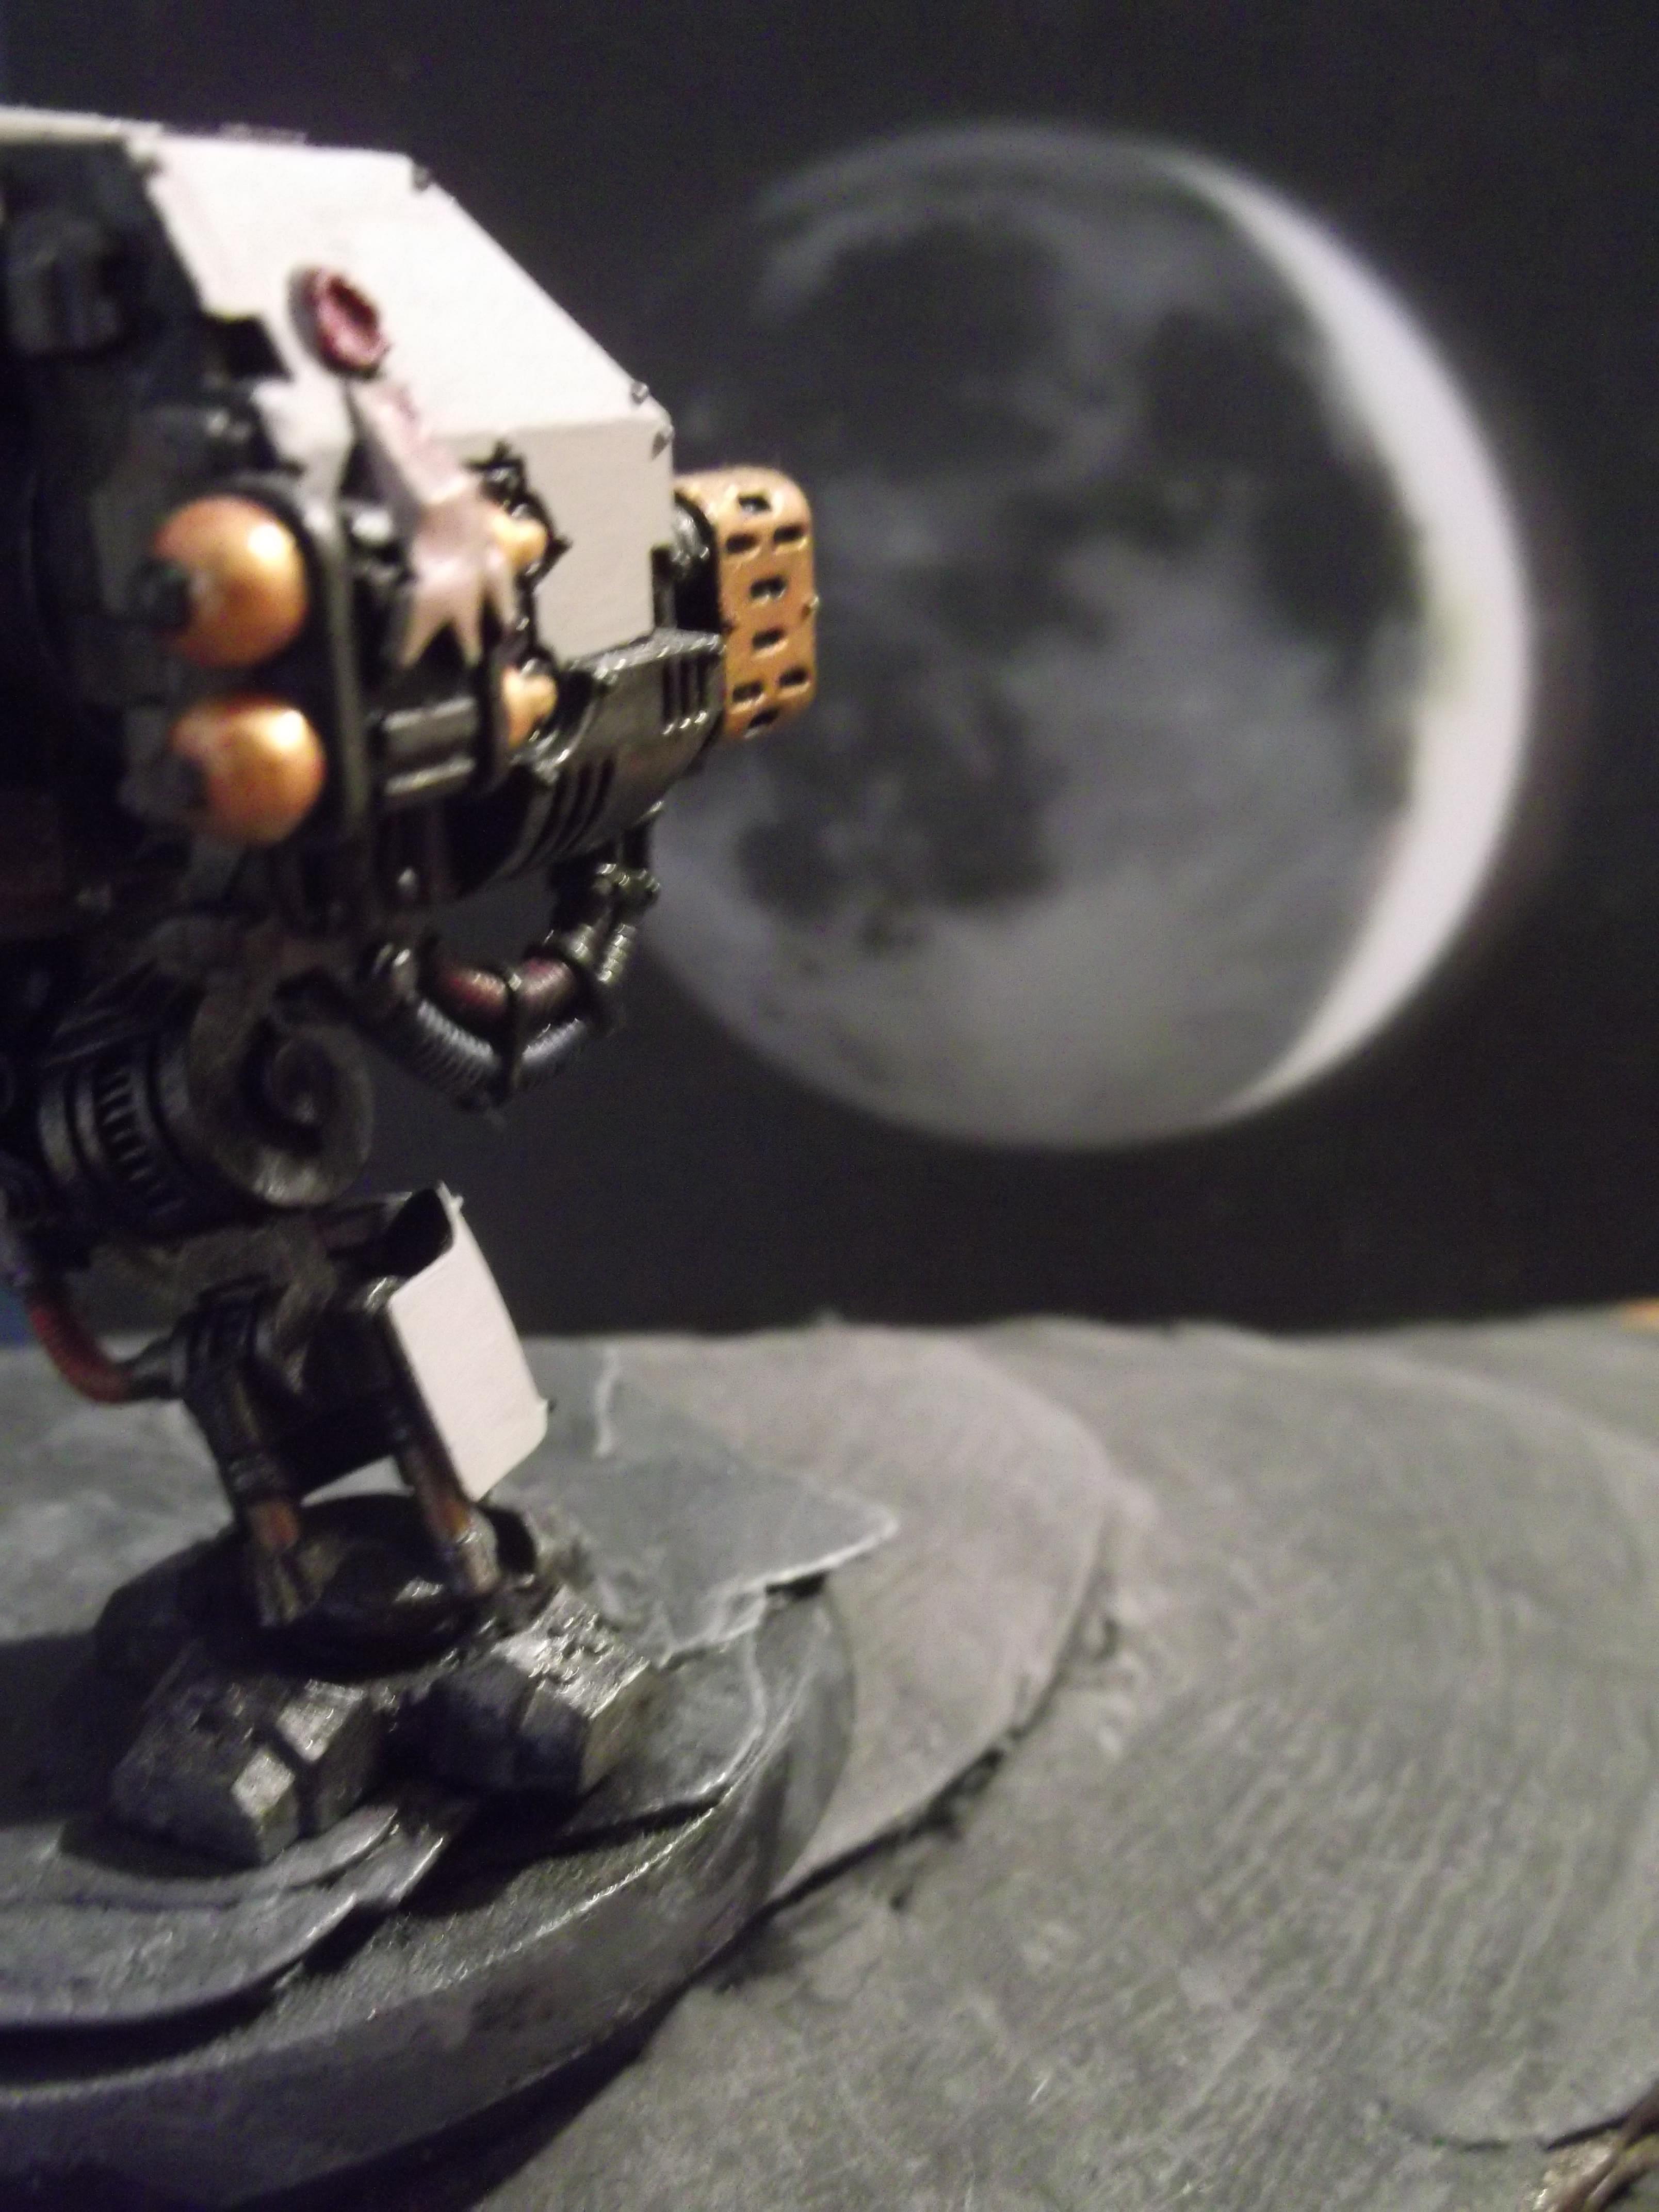 Black, Cybot, Dheneb, Dhenebs, Dreadnough, Flag, Laser, Melter, Moon, Multimelter, Space, Space Marines, Walker